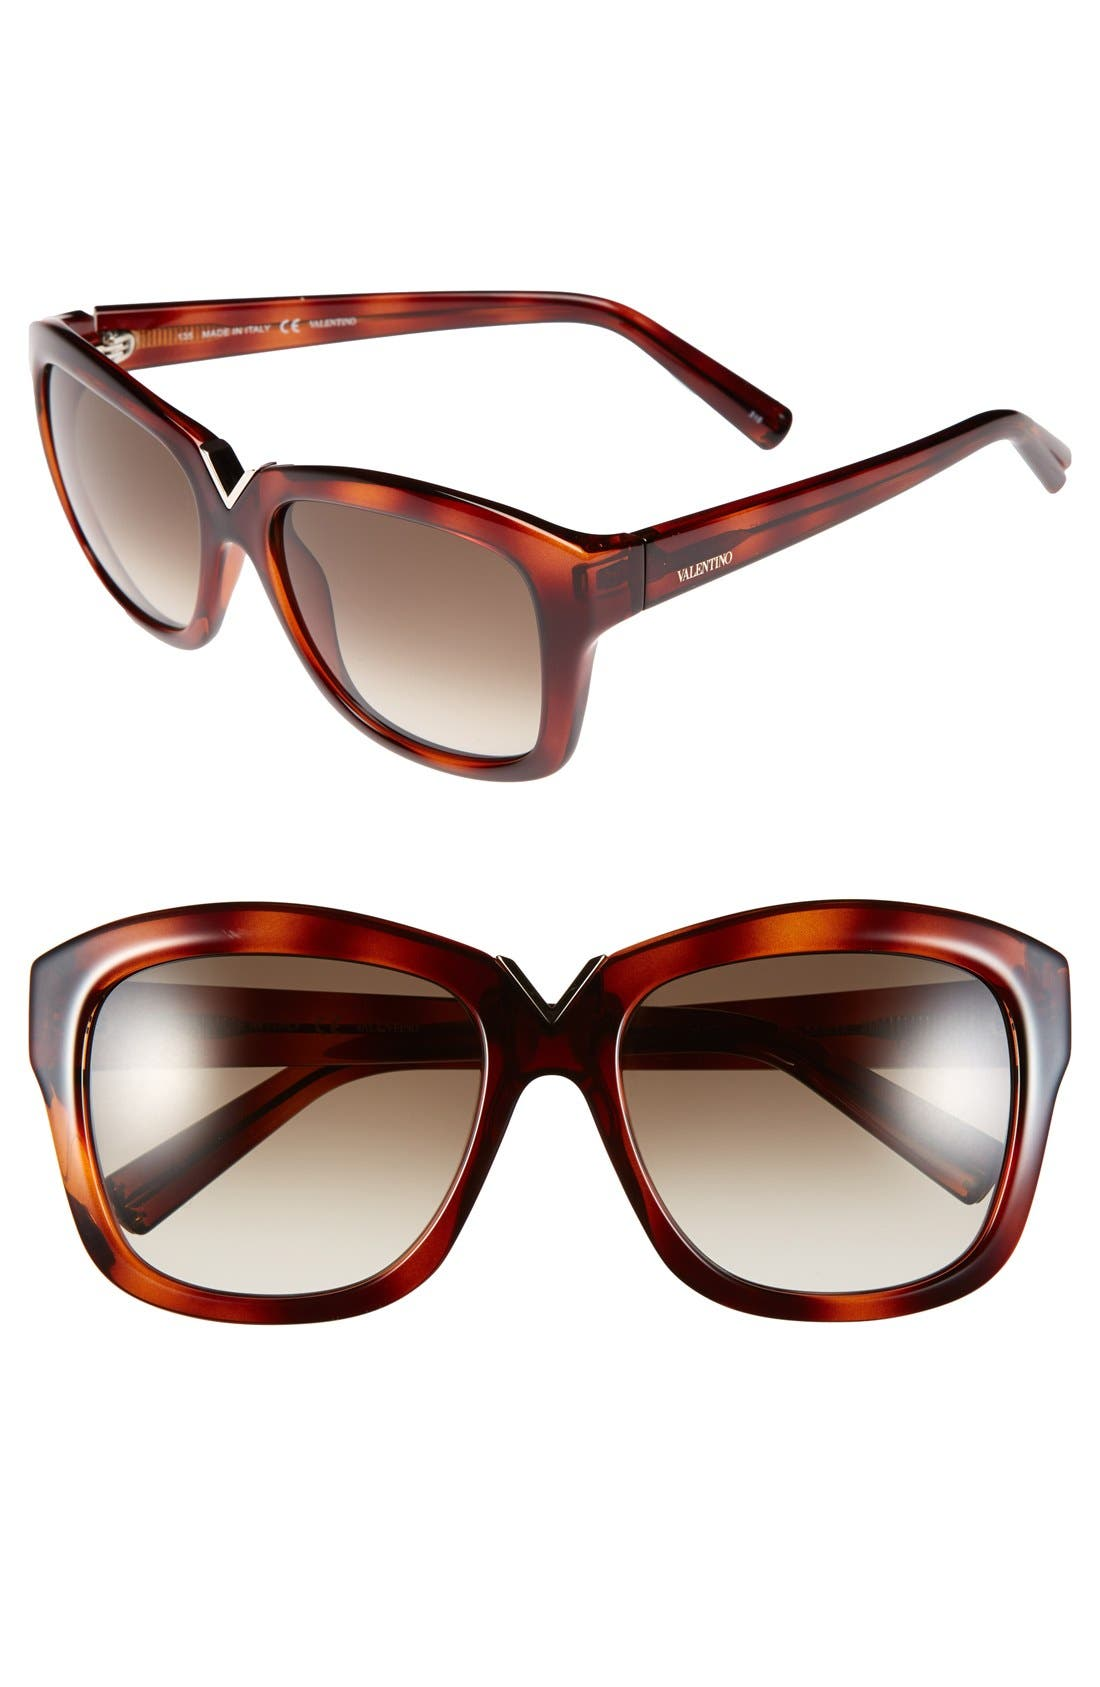 Main Image - Valentino 55mm Retro Sunglasses